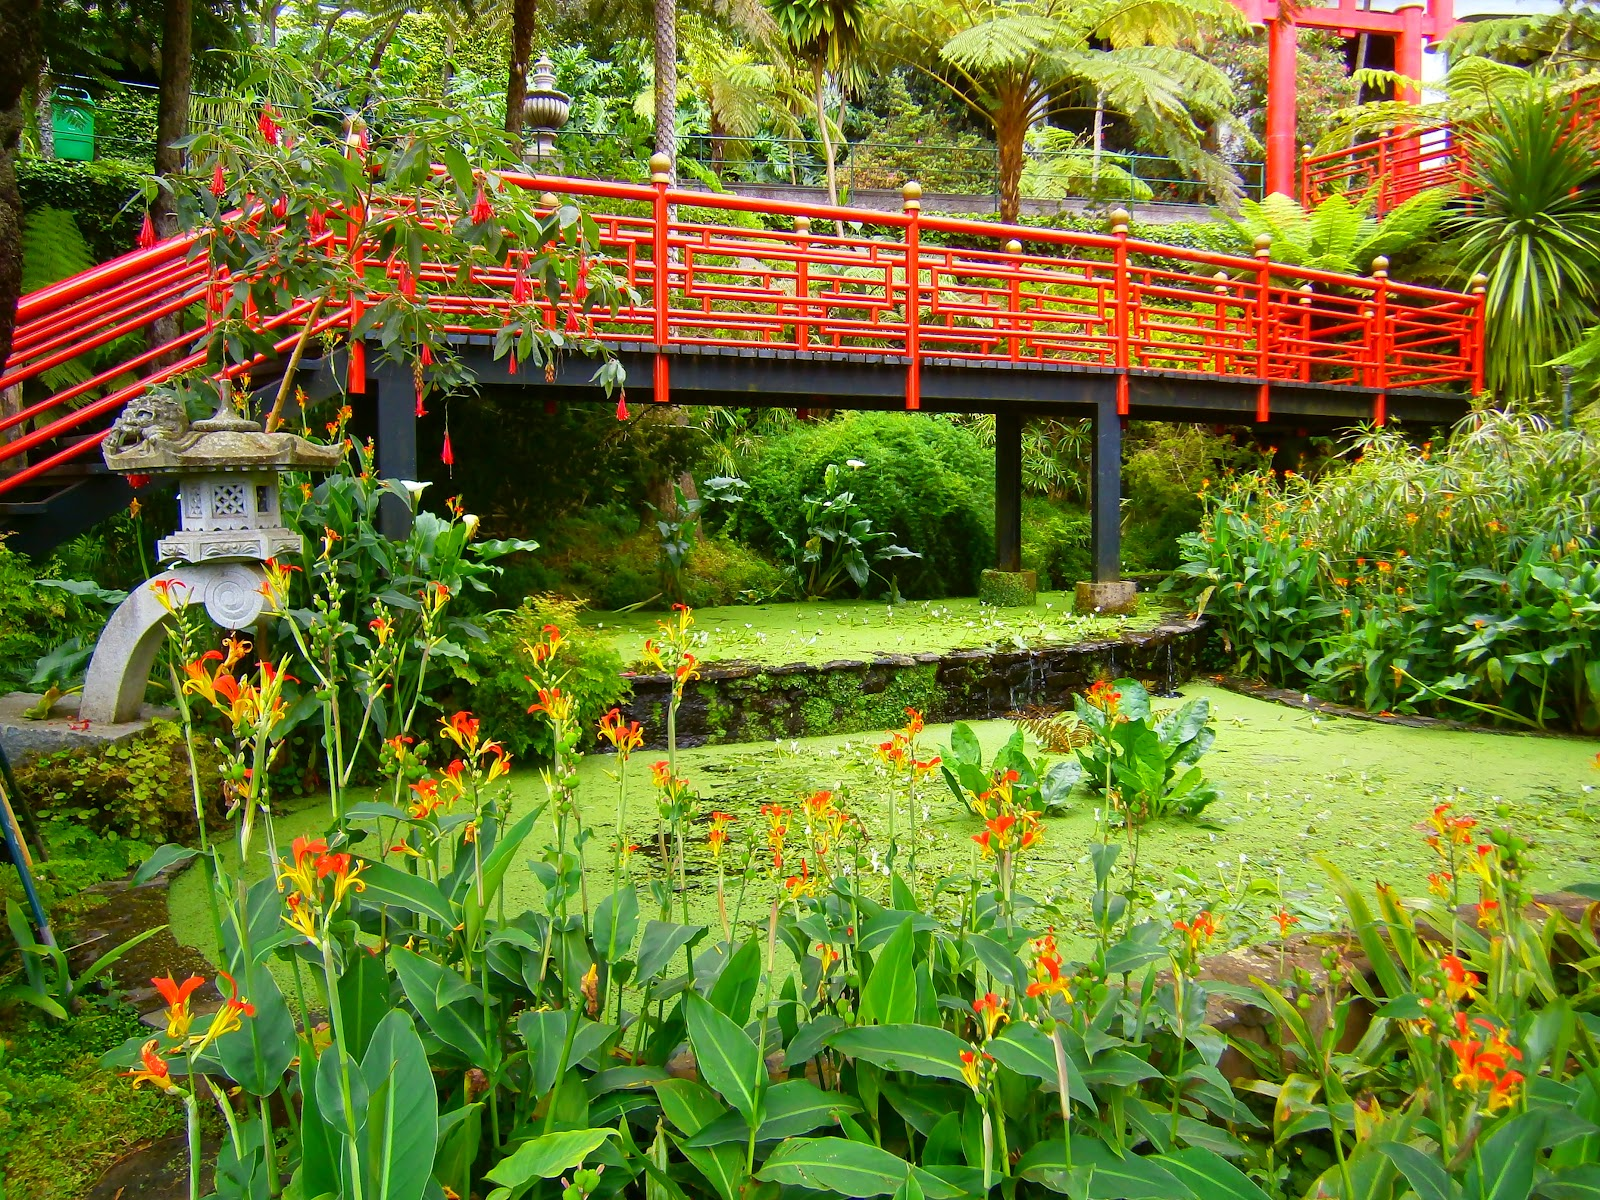 plantas jardim tropical : plantas jardim tropical:Madeira Jardim Tropical